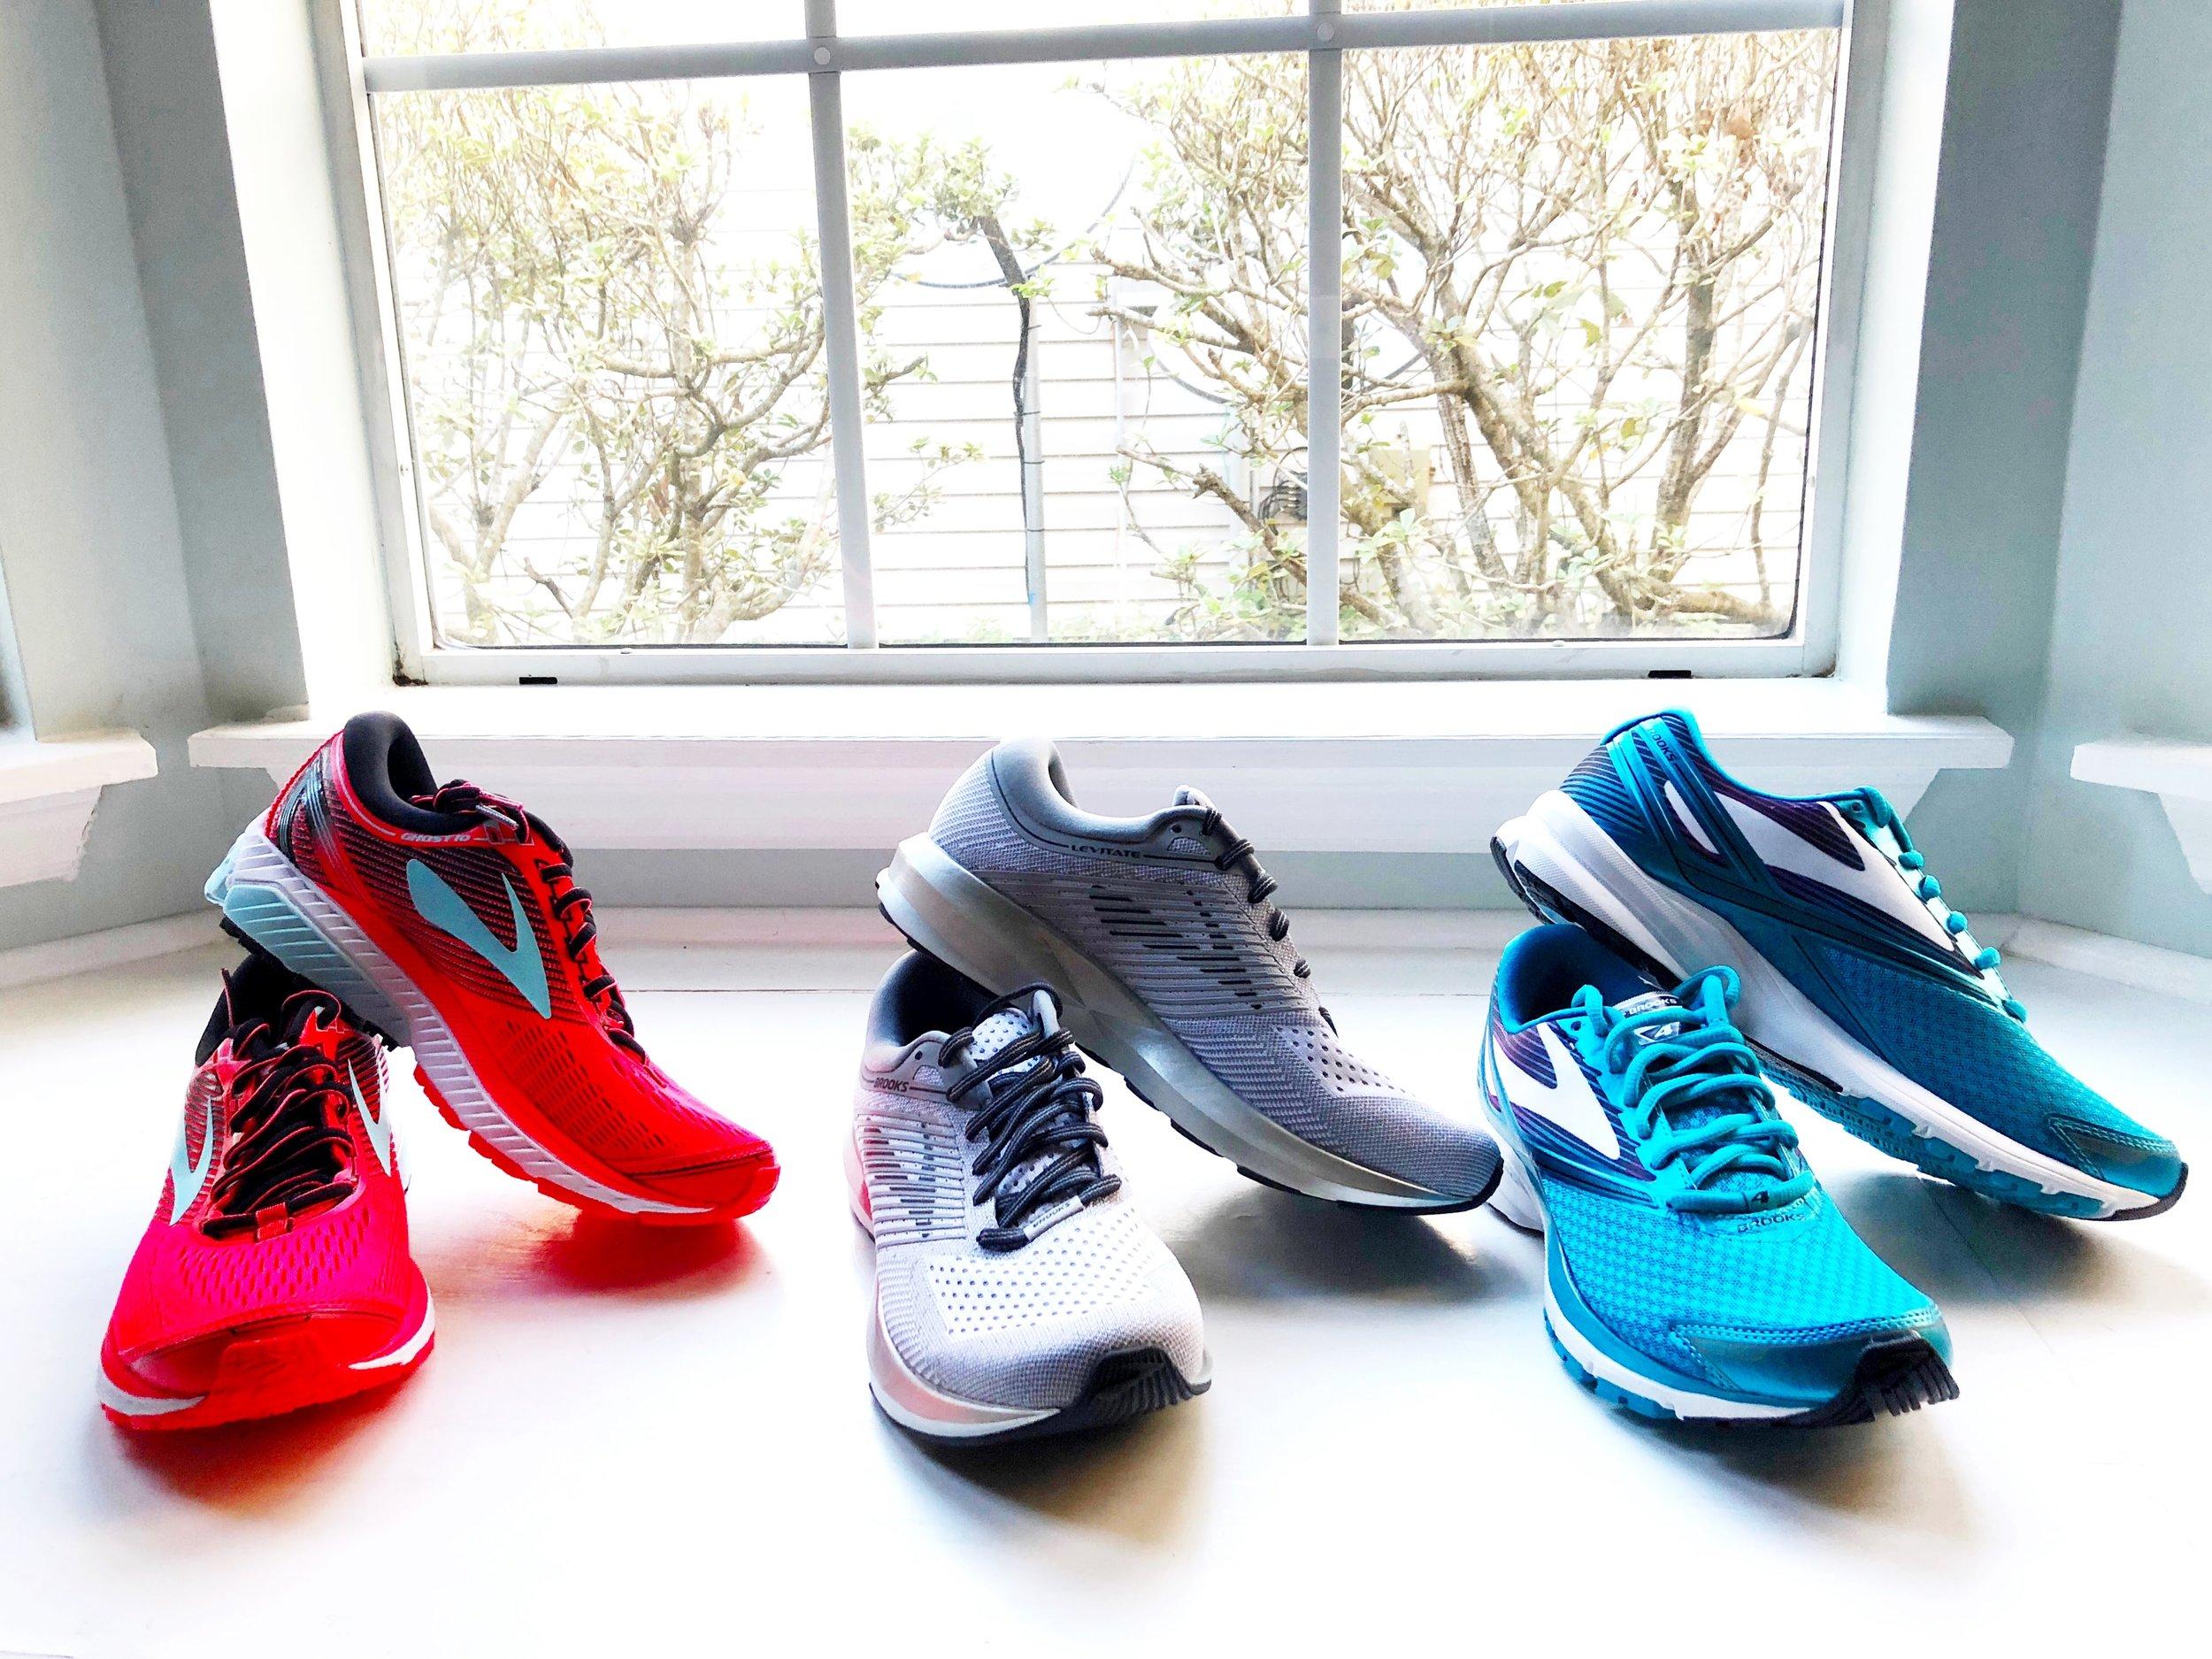 New Running shoes - Brooks Ghost, Brooks Levitate (LOVE!), Brooks Launch